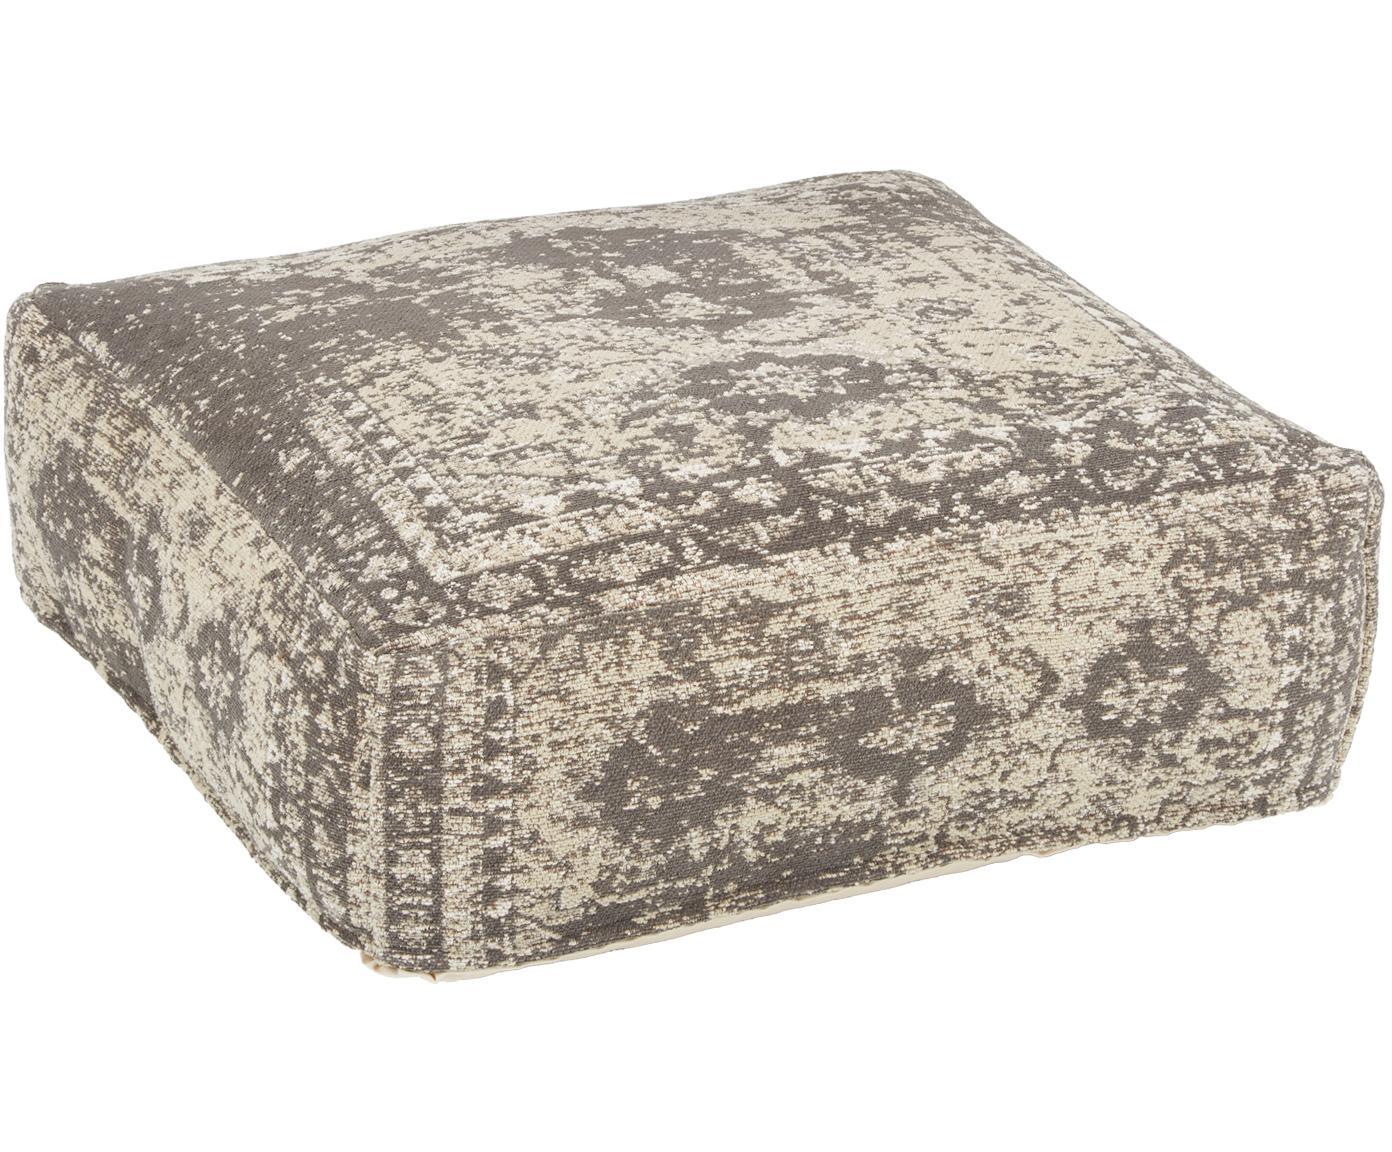 Cojín de suelo Rebel, estilo vintage, Funda: 95%algodón, 5%poliéster, Interior: poliéster, Gris oscuro, crema, An 70 x Al 20 cm